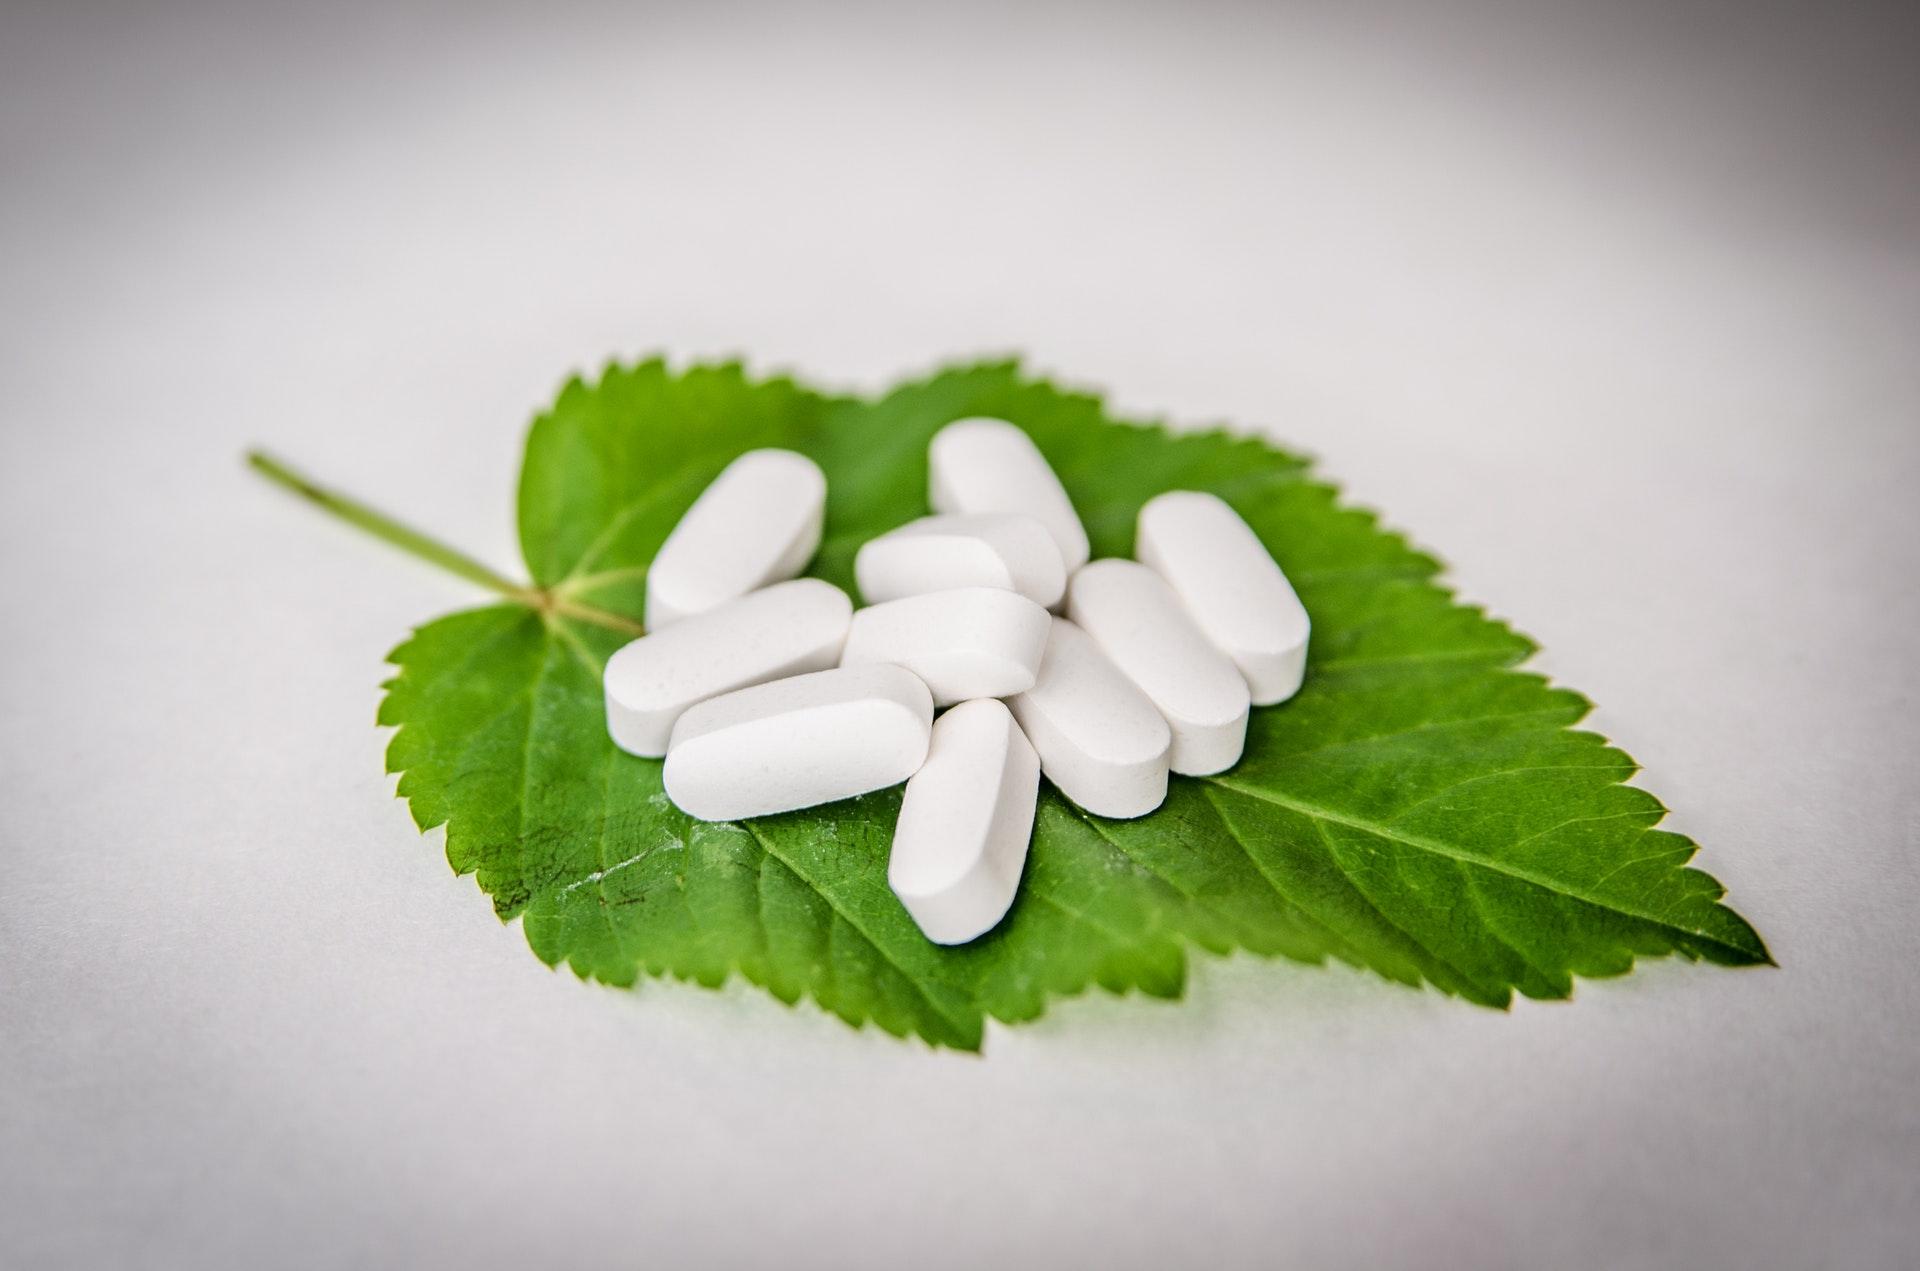 10 reasons to choose homeopathy